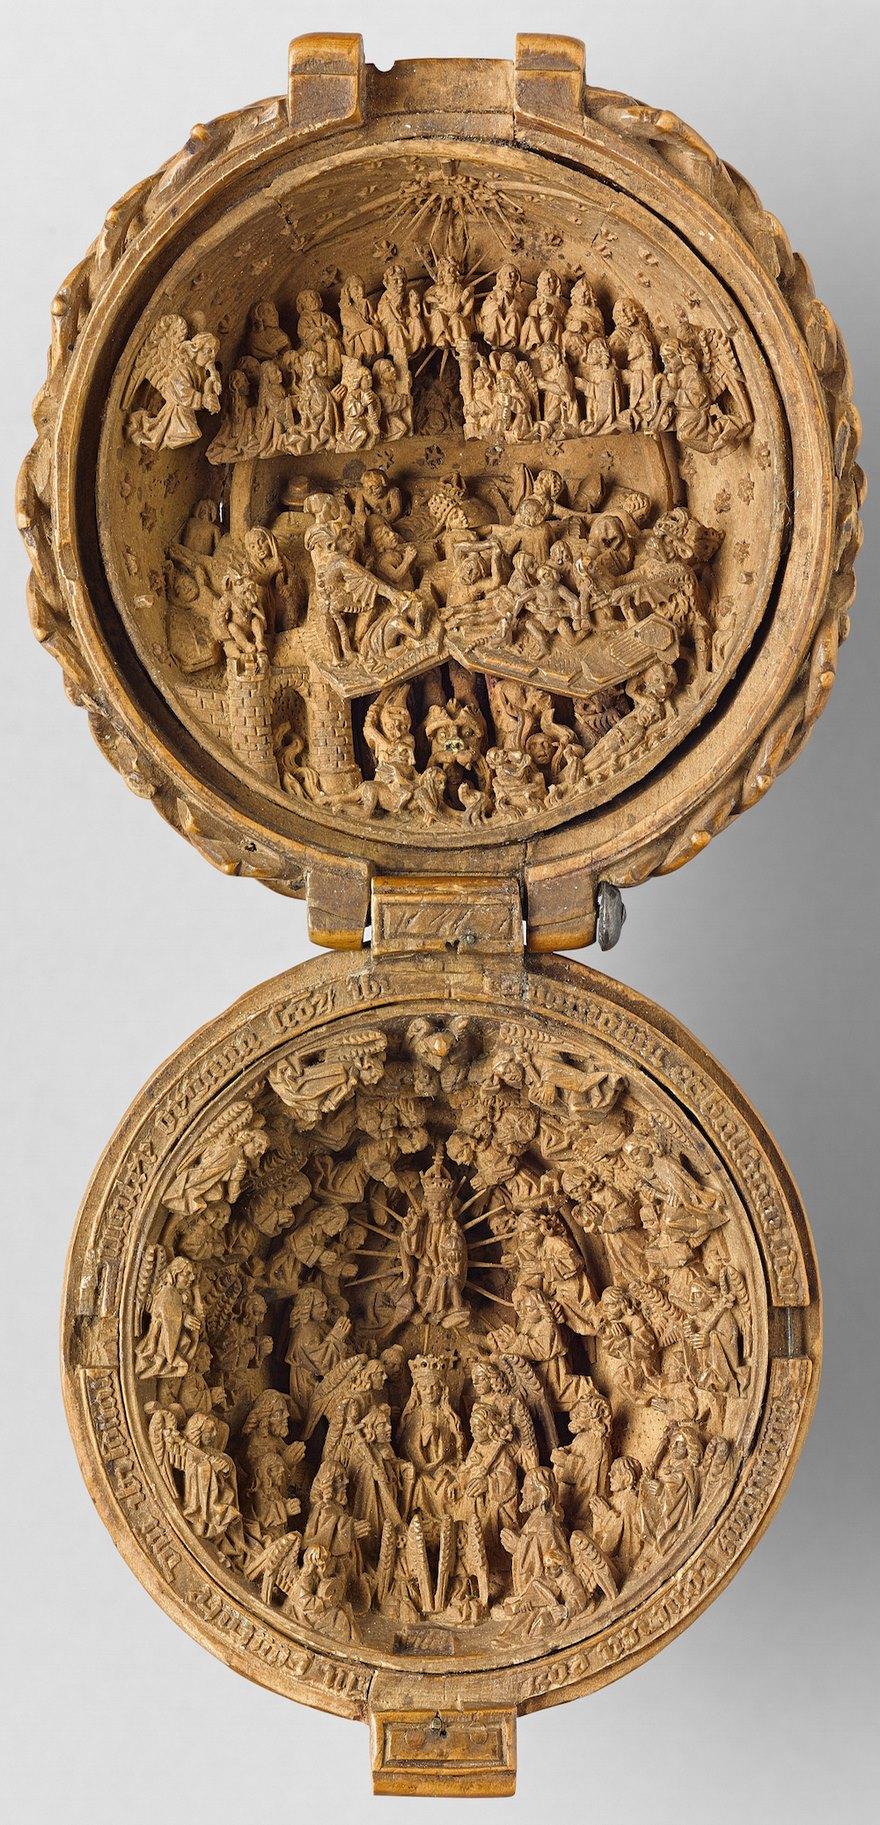 miniatura de boj tallados al 16 del siglo-2